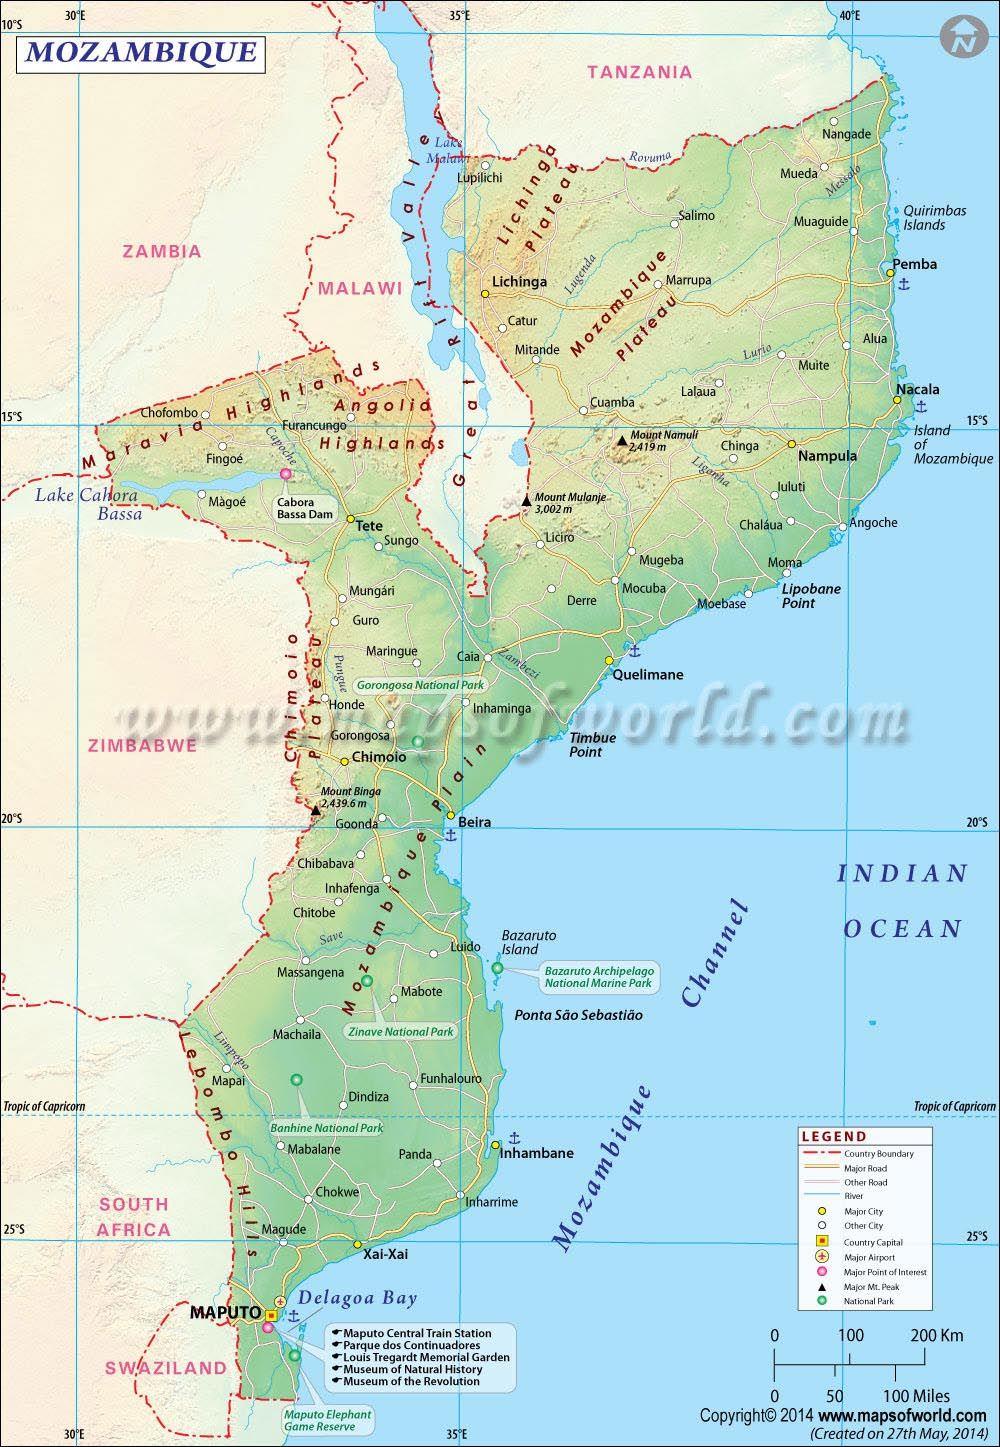 Mozambique map mozambique pinterest zimbabwe and city mozambique map gumiabroncs Image collections